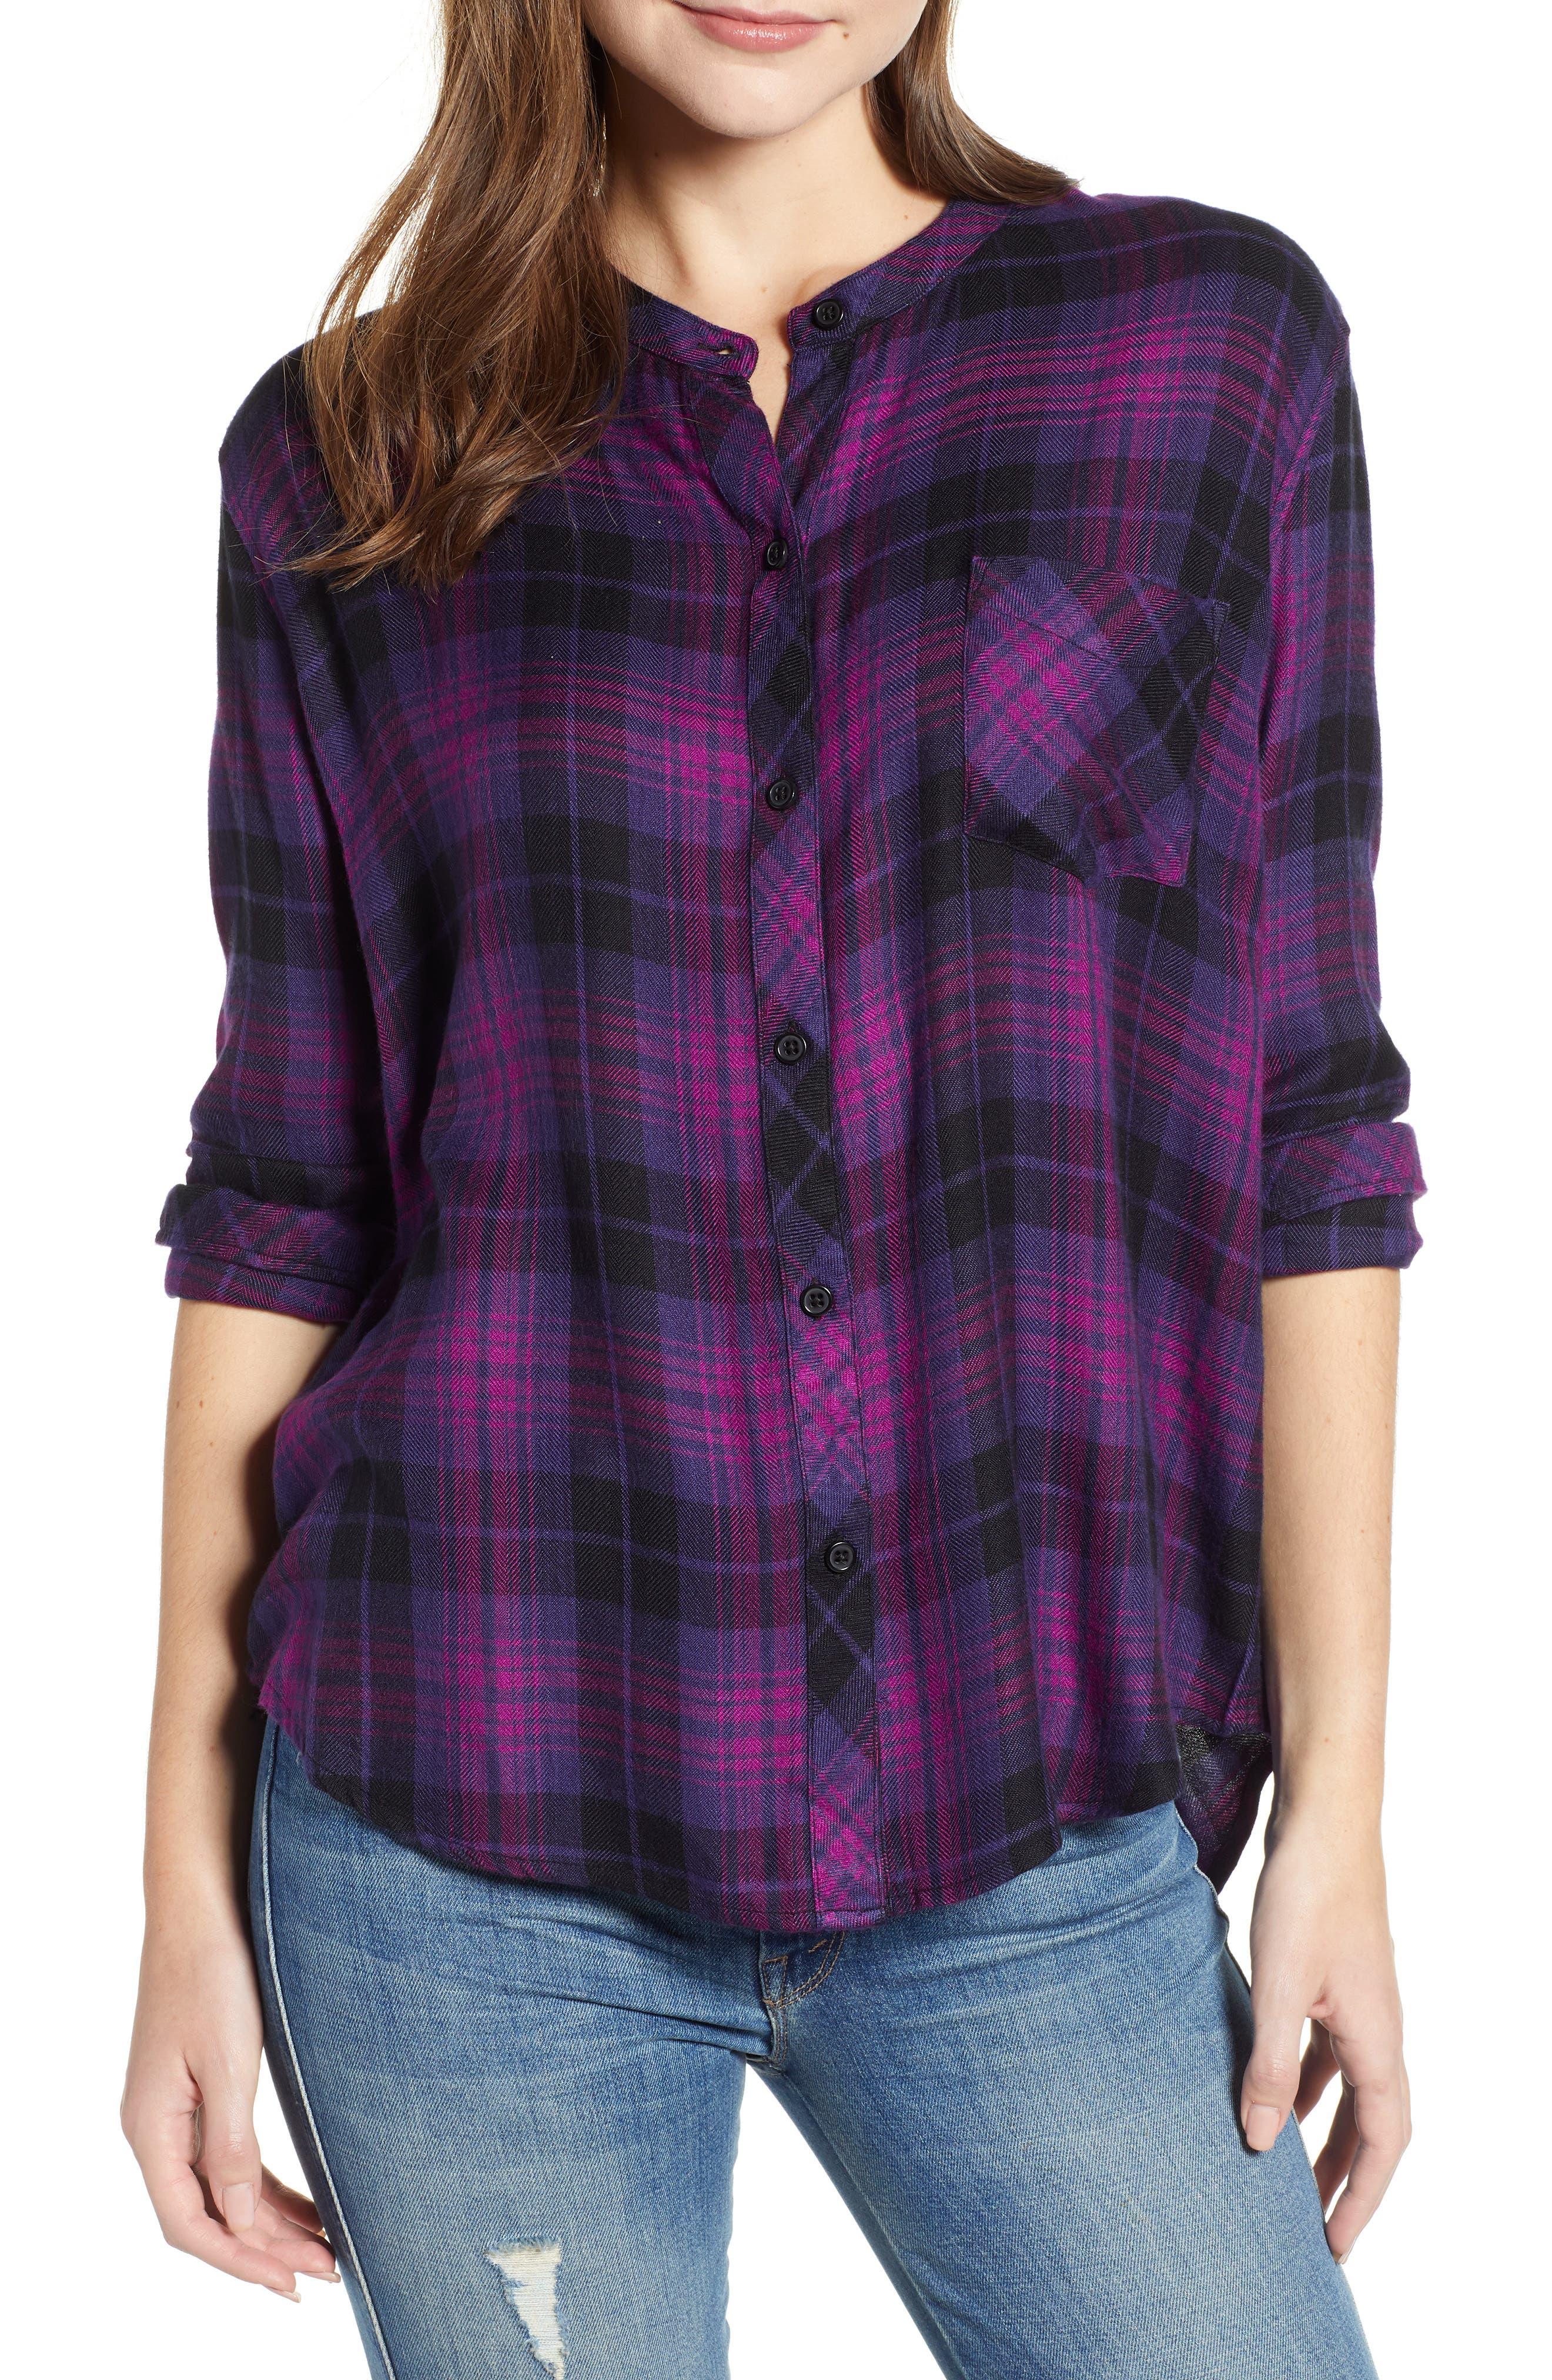 Allison Plaid Shirt,                             Main thumbnail 1, color,                             MAGENTA IRIS BLACK